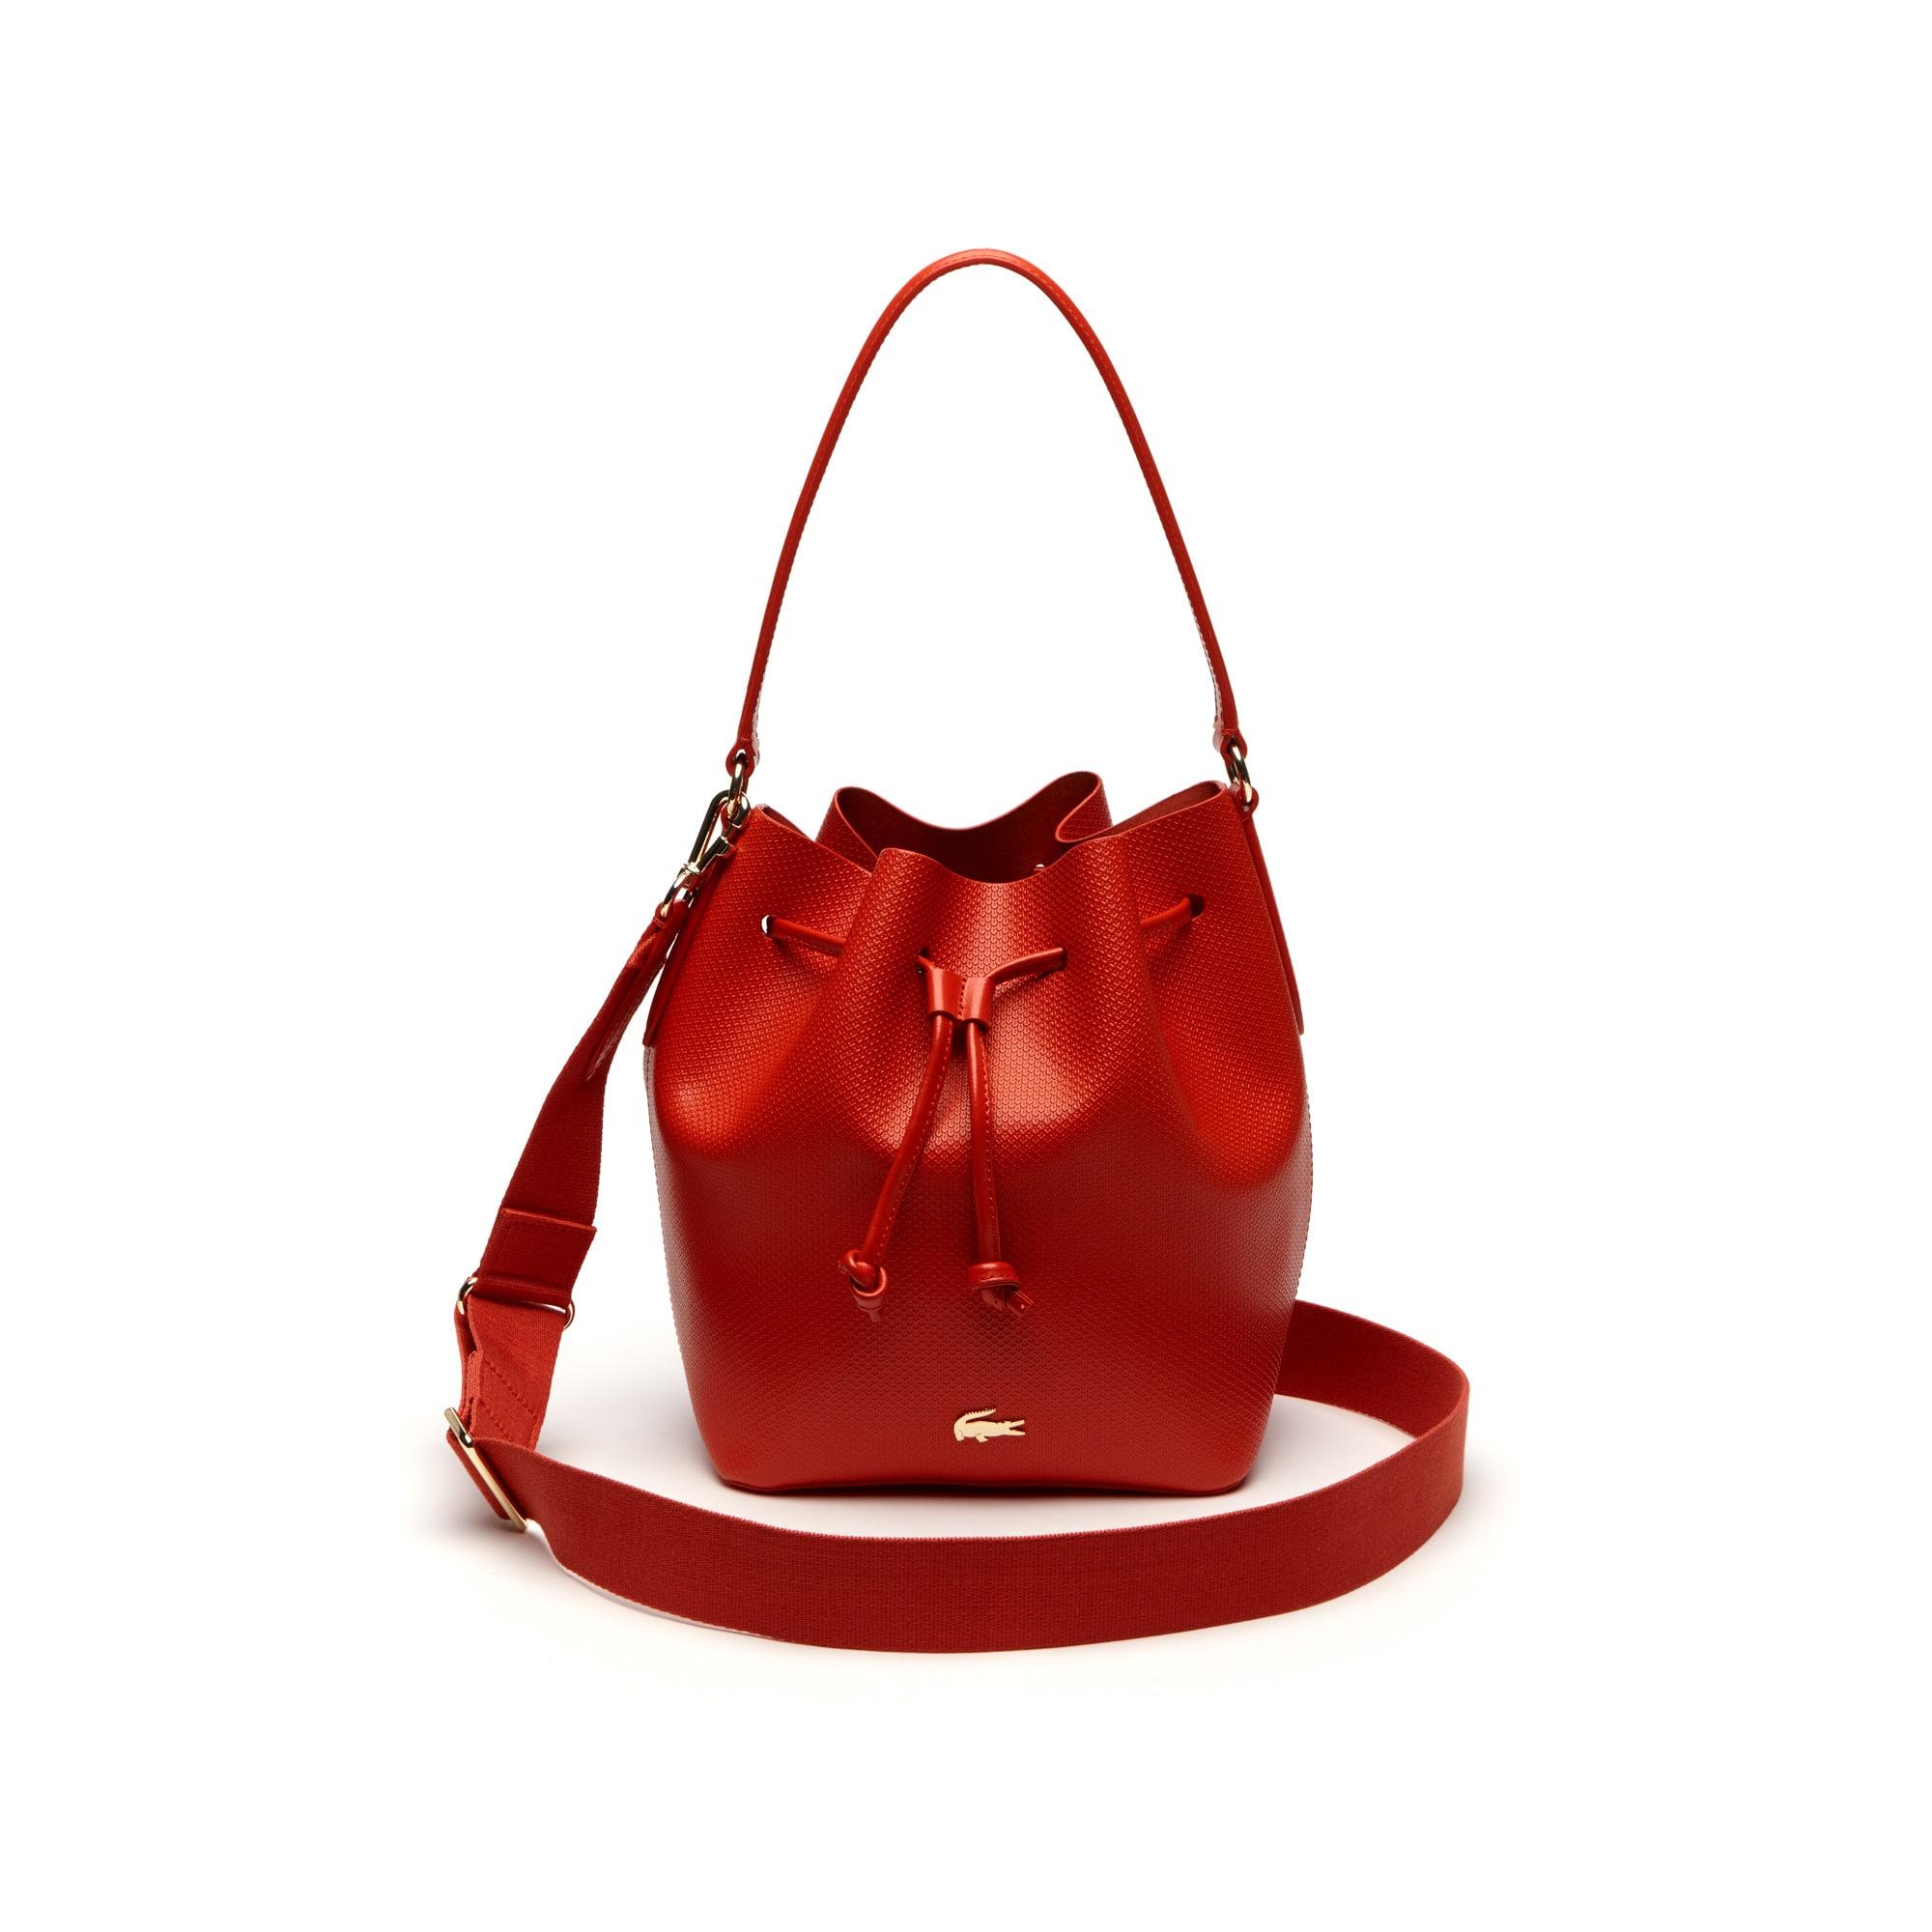 Damen CHANTACO Beuteltasche aus Piqué-Leder